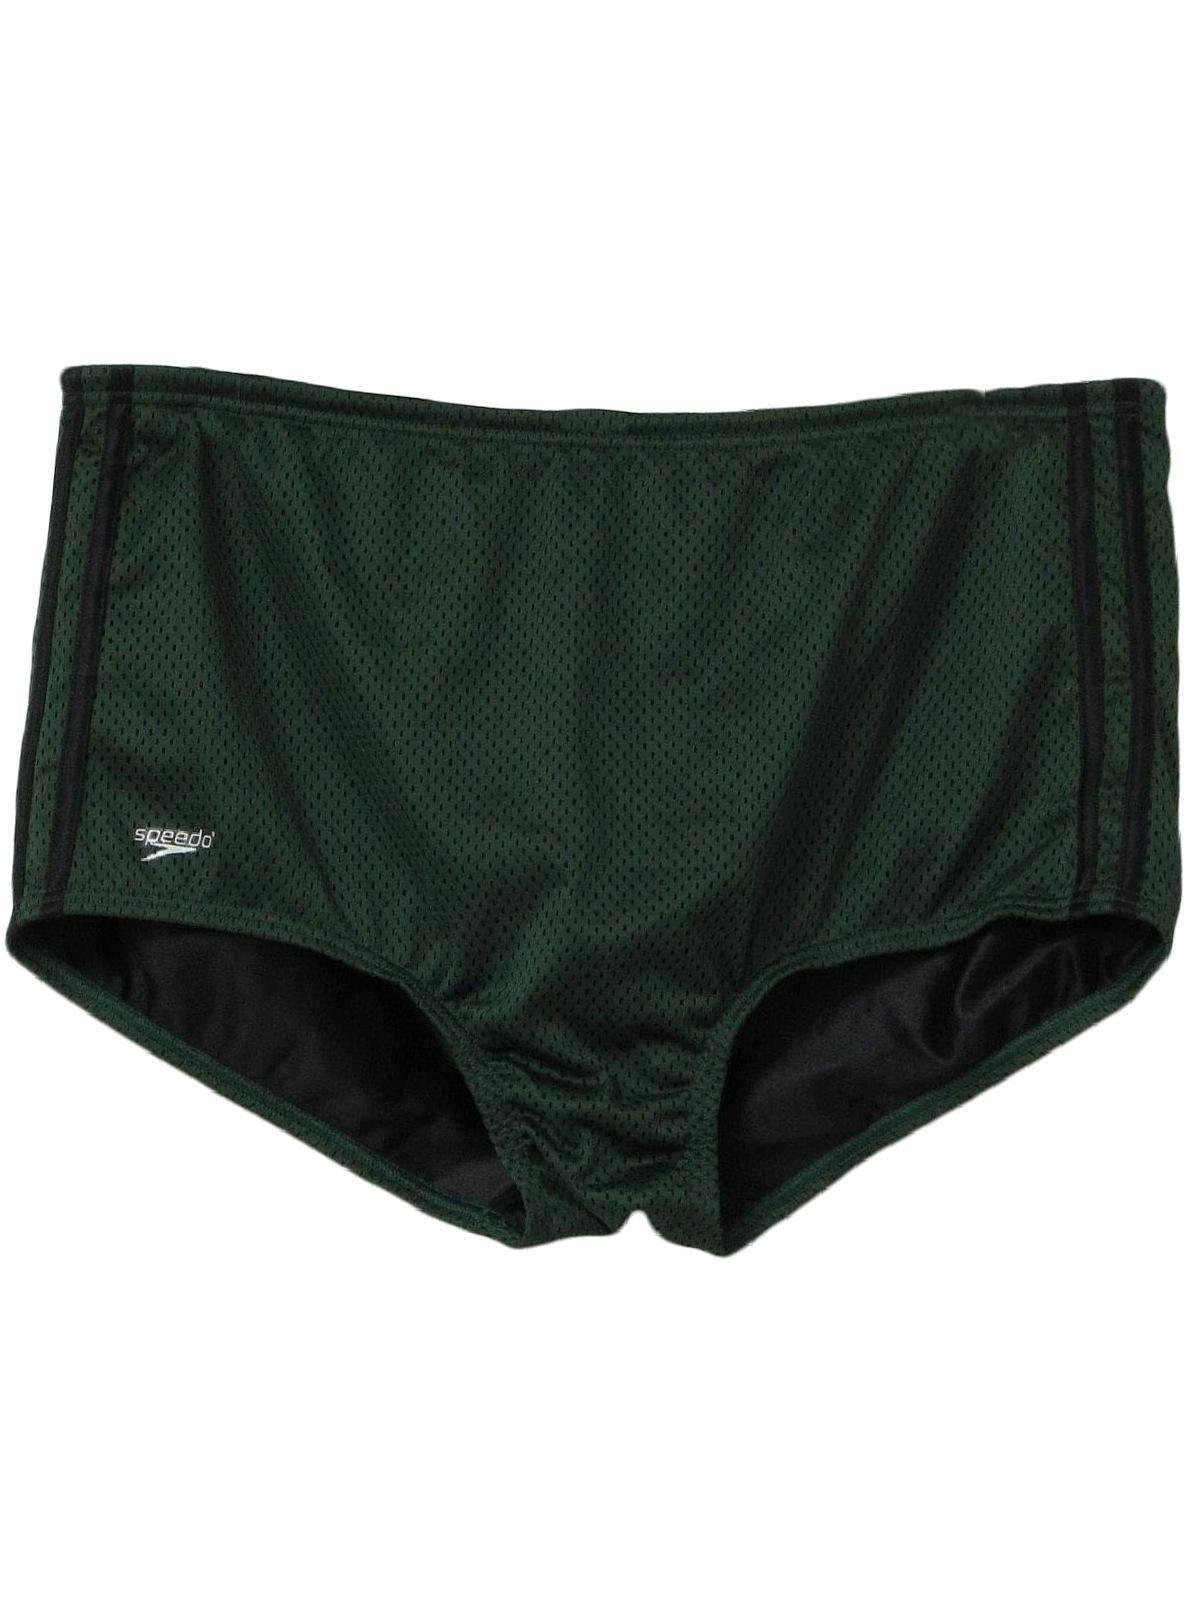 df372c608476e 1990's Speedo Mens Wicked 90s Swim Shorts $22.00 Not in stock. Item No.  222835